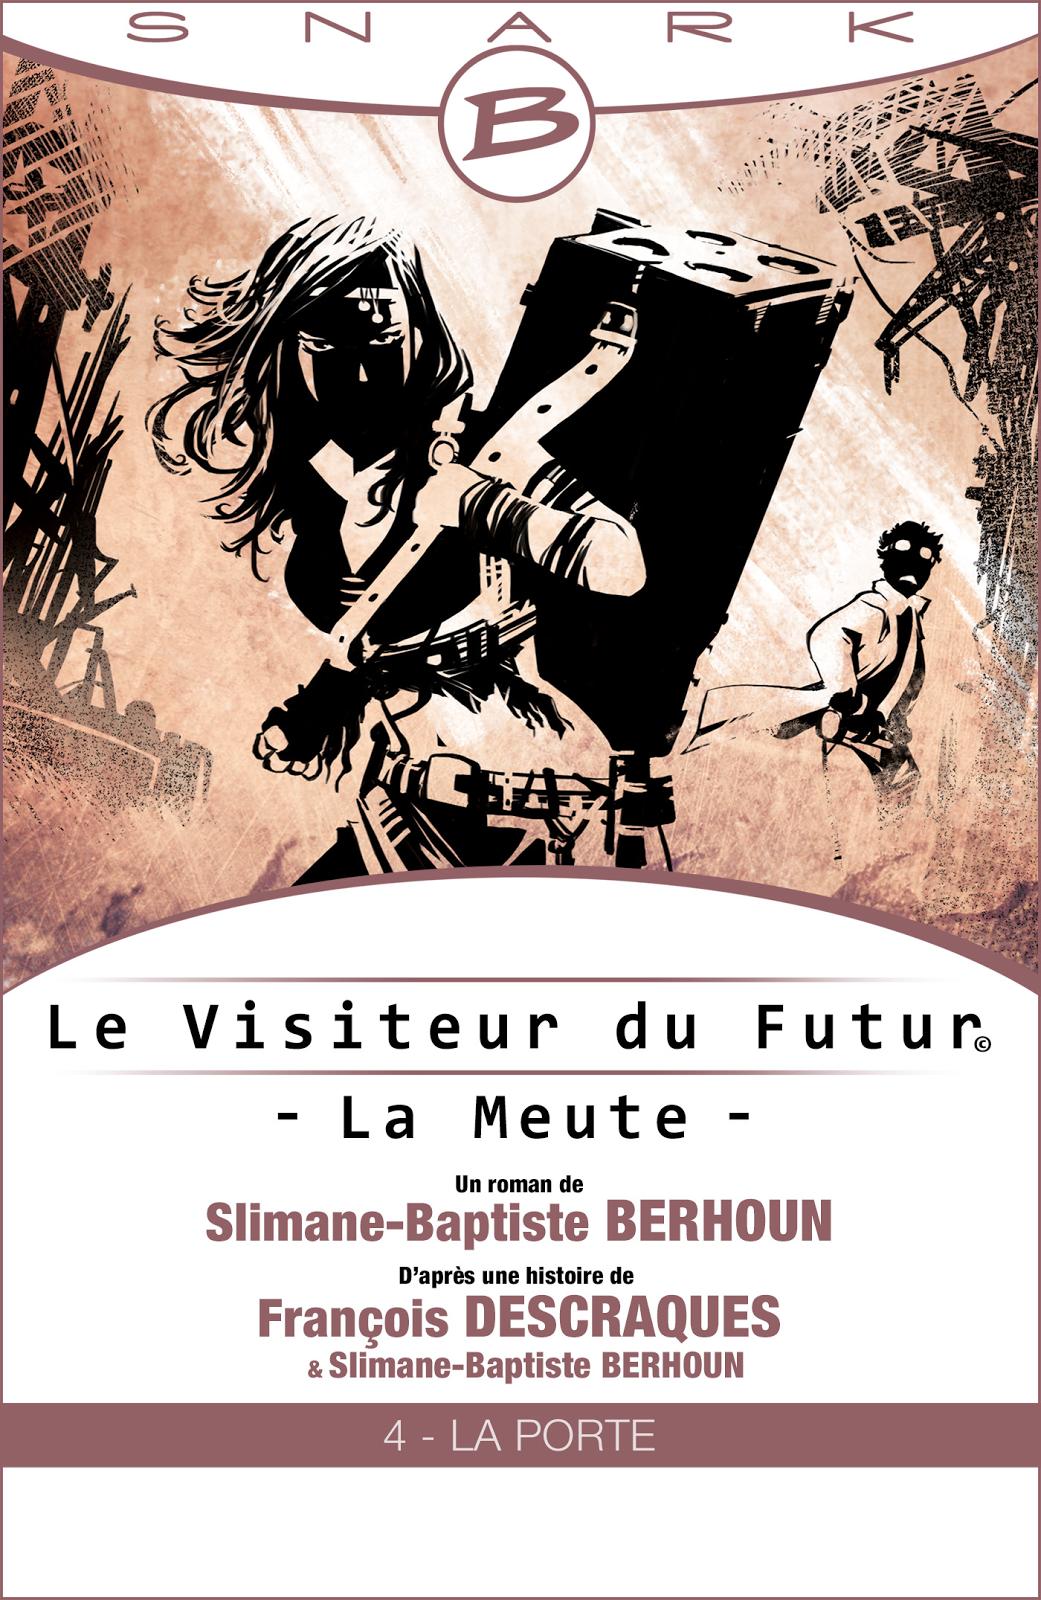 http://regardenfant.blogspot.be/2015/04/la-porte-de-slimane-baptiste-berhoun-le.html